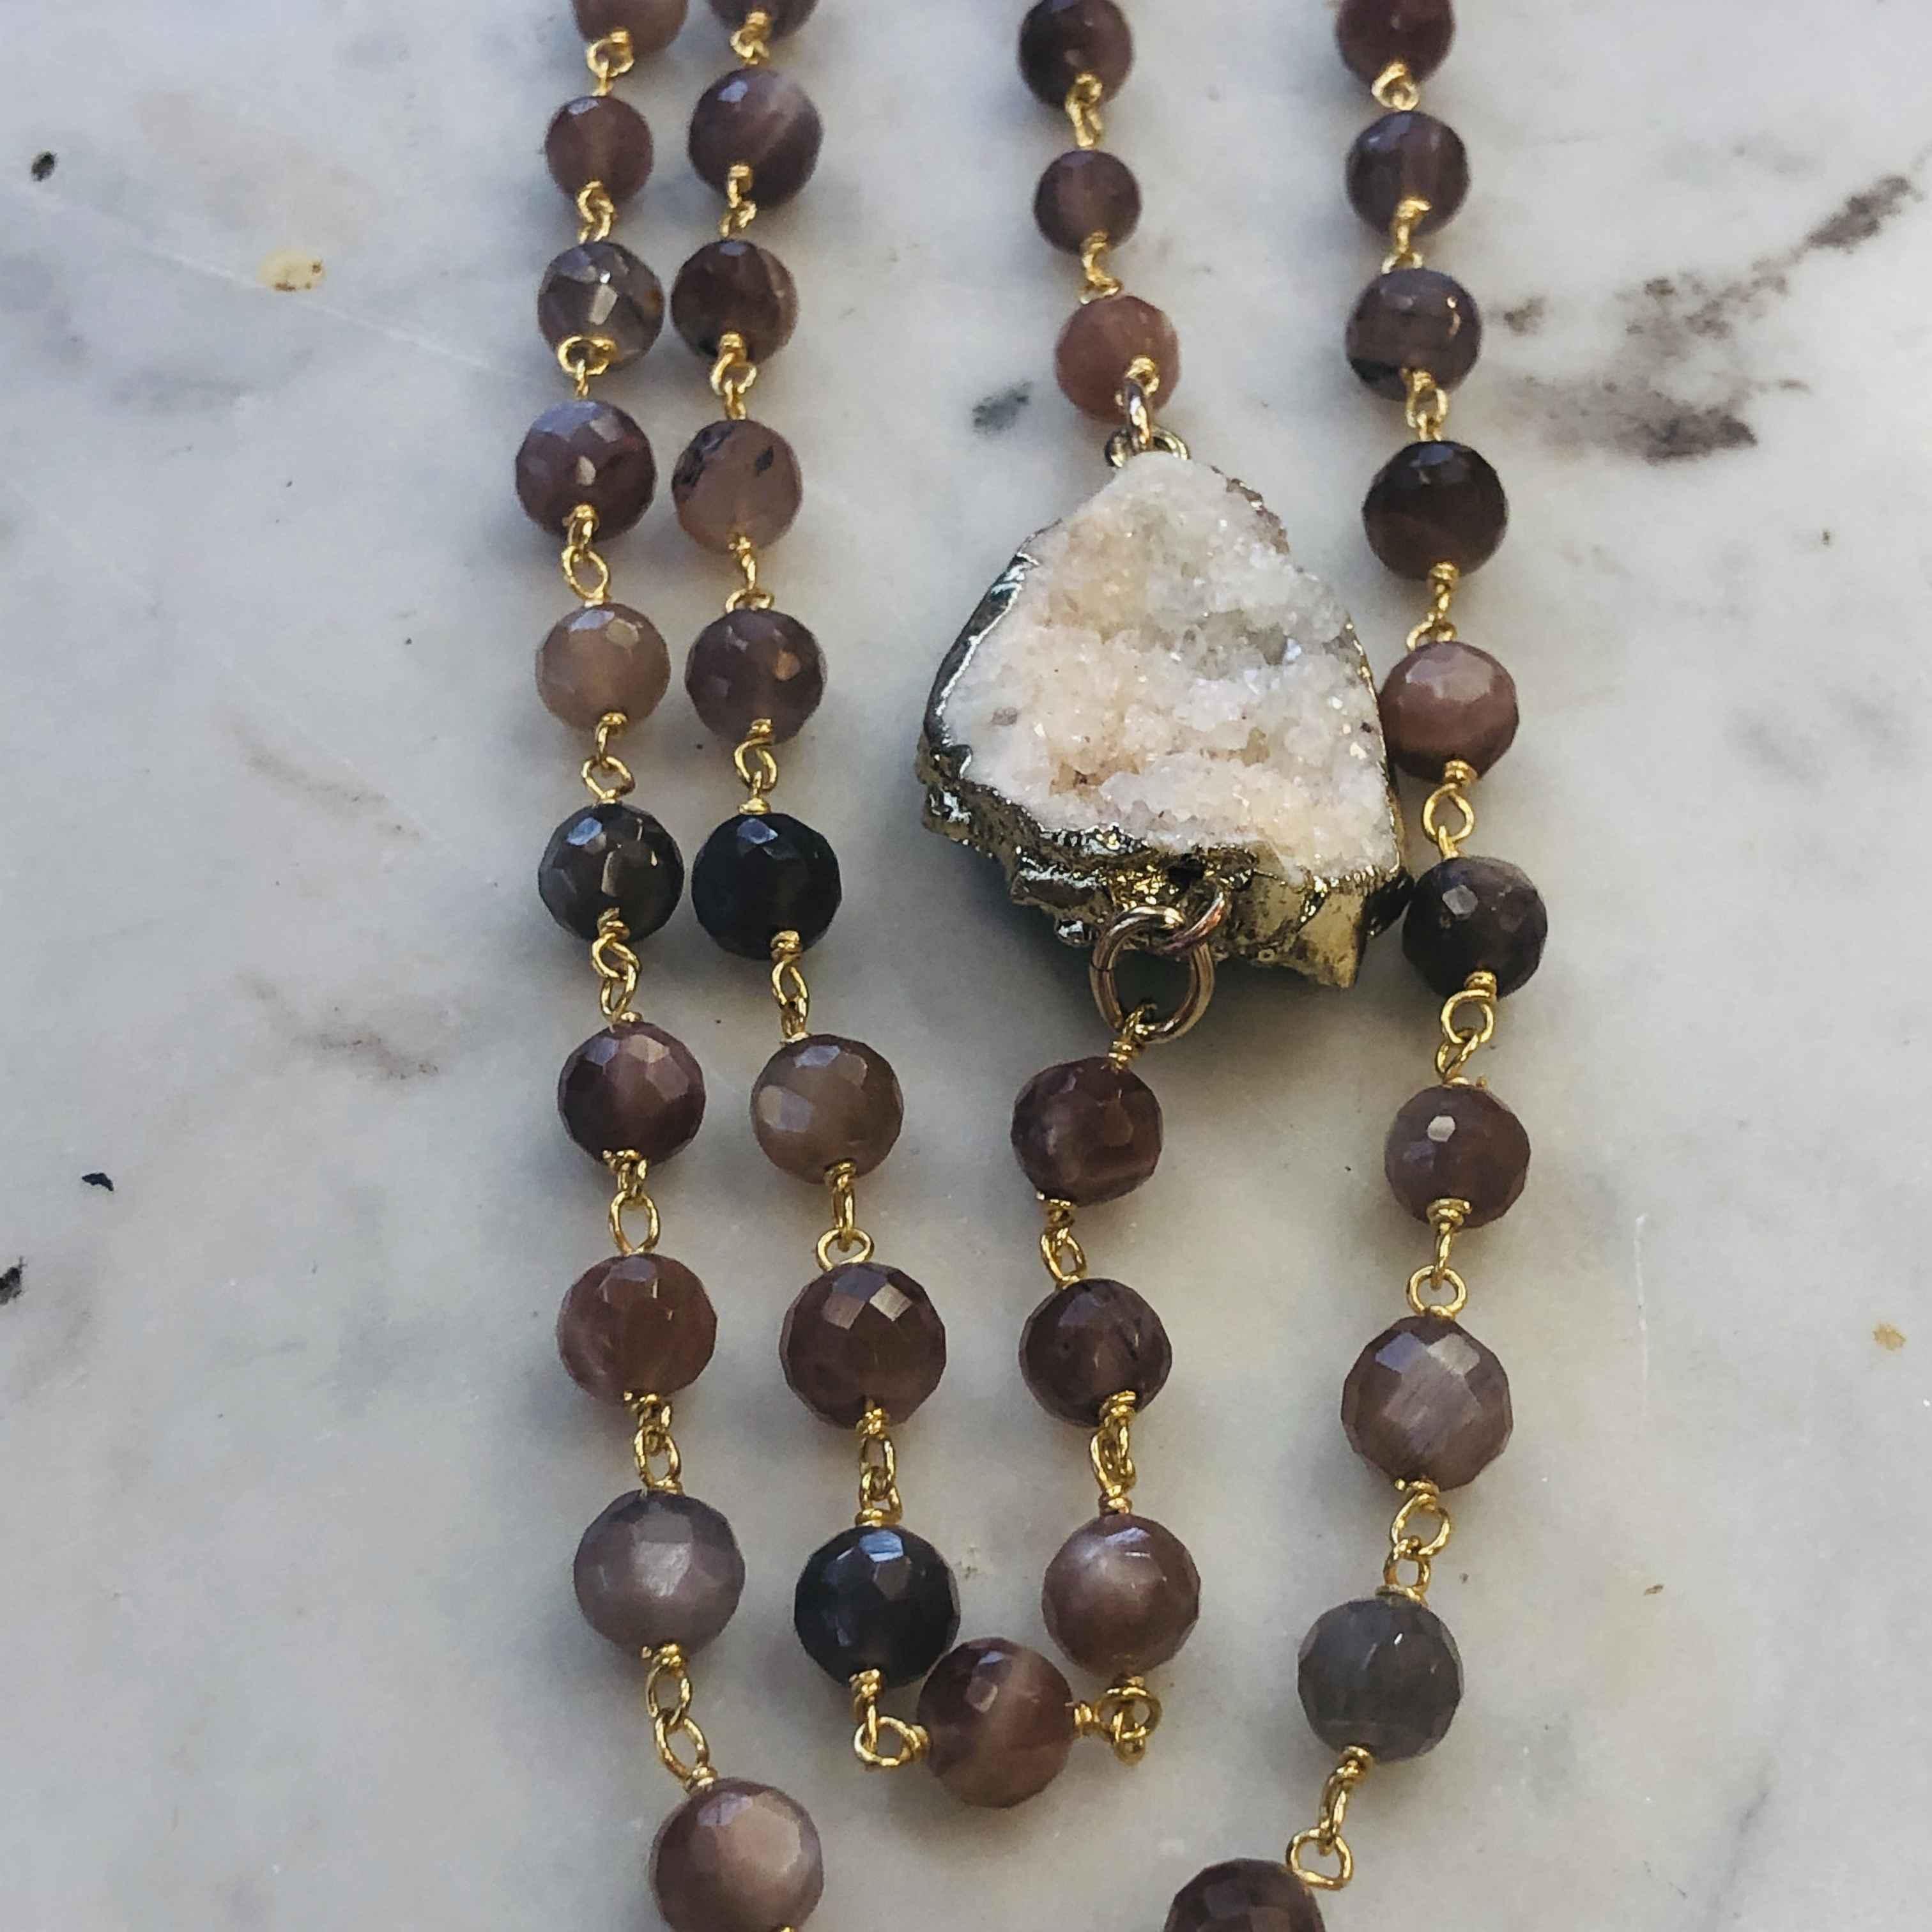 Chocolate Druzy and Moonstones Necklace 34